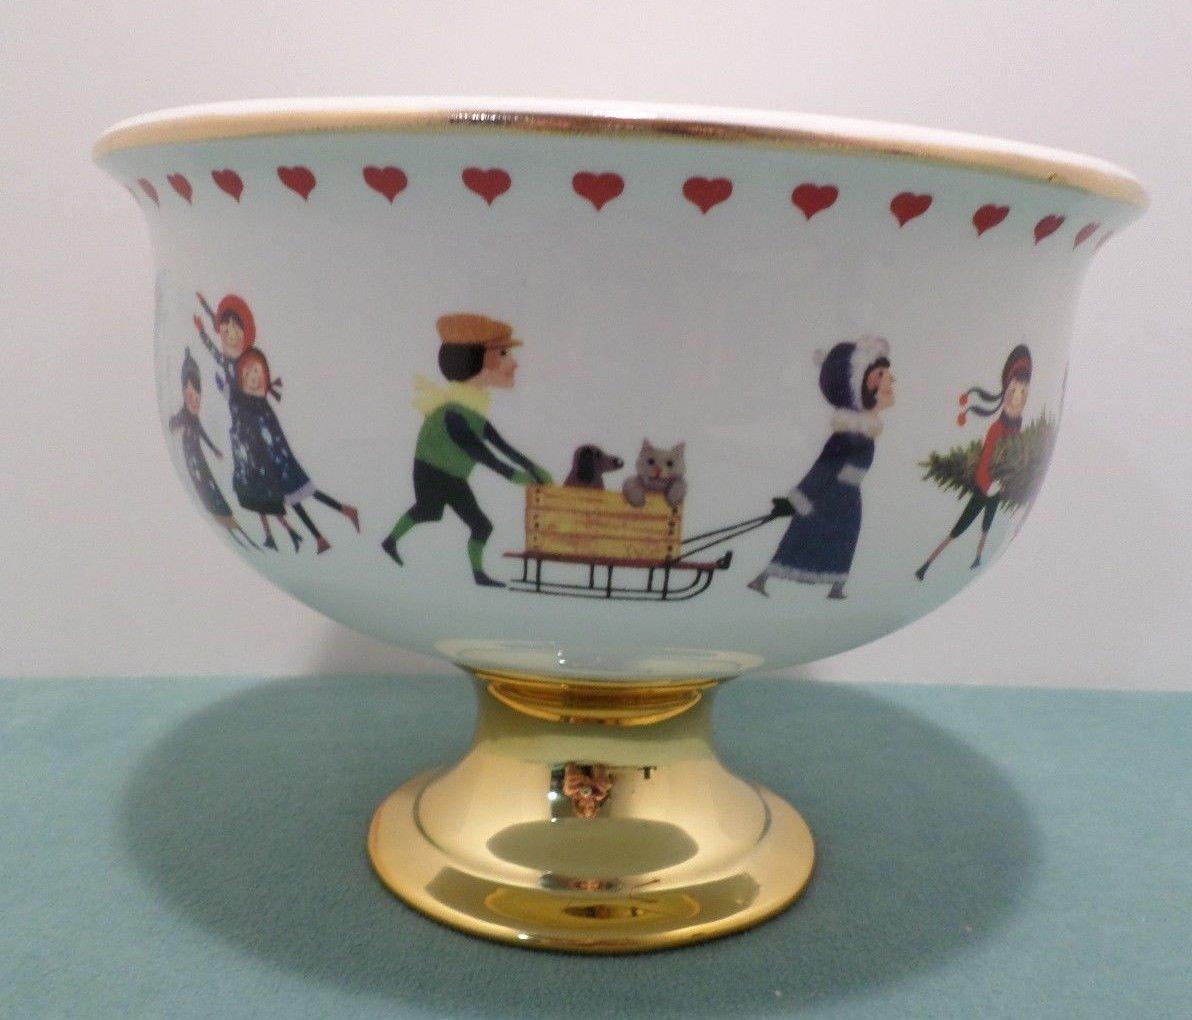 Christmas bowl on pedestal Porcelain by Charles Wysocki Teleflora Gift